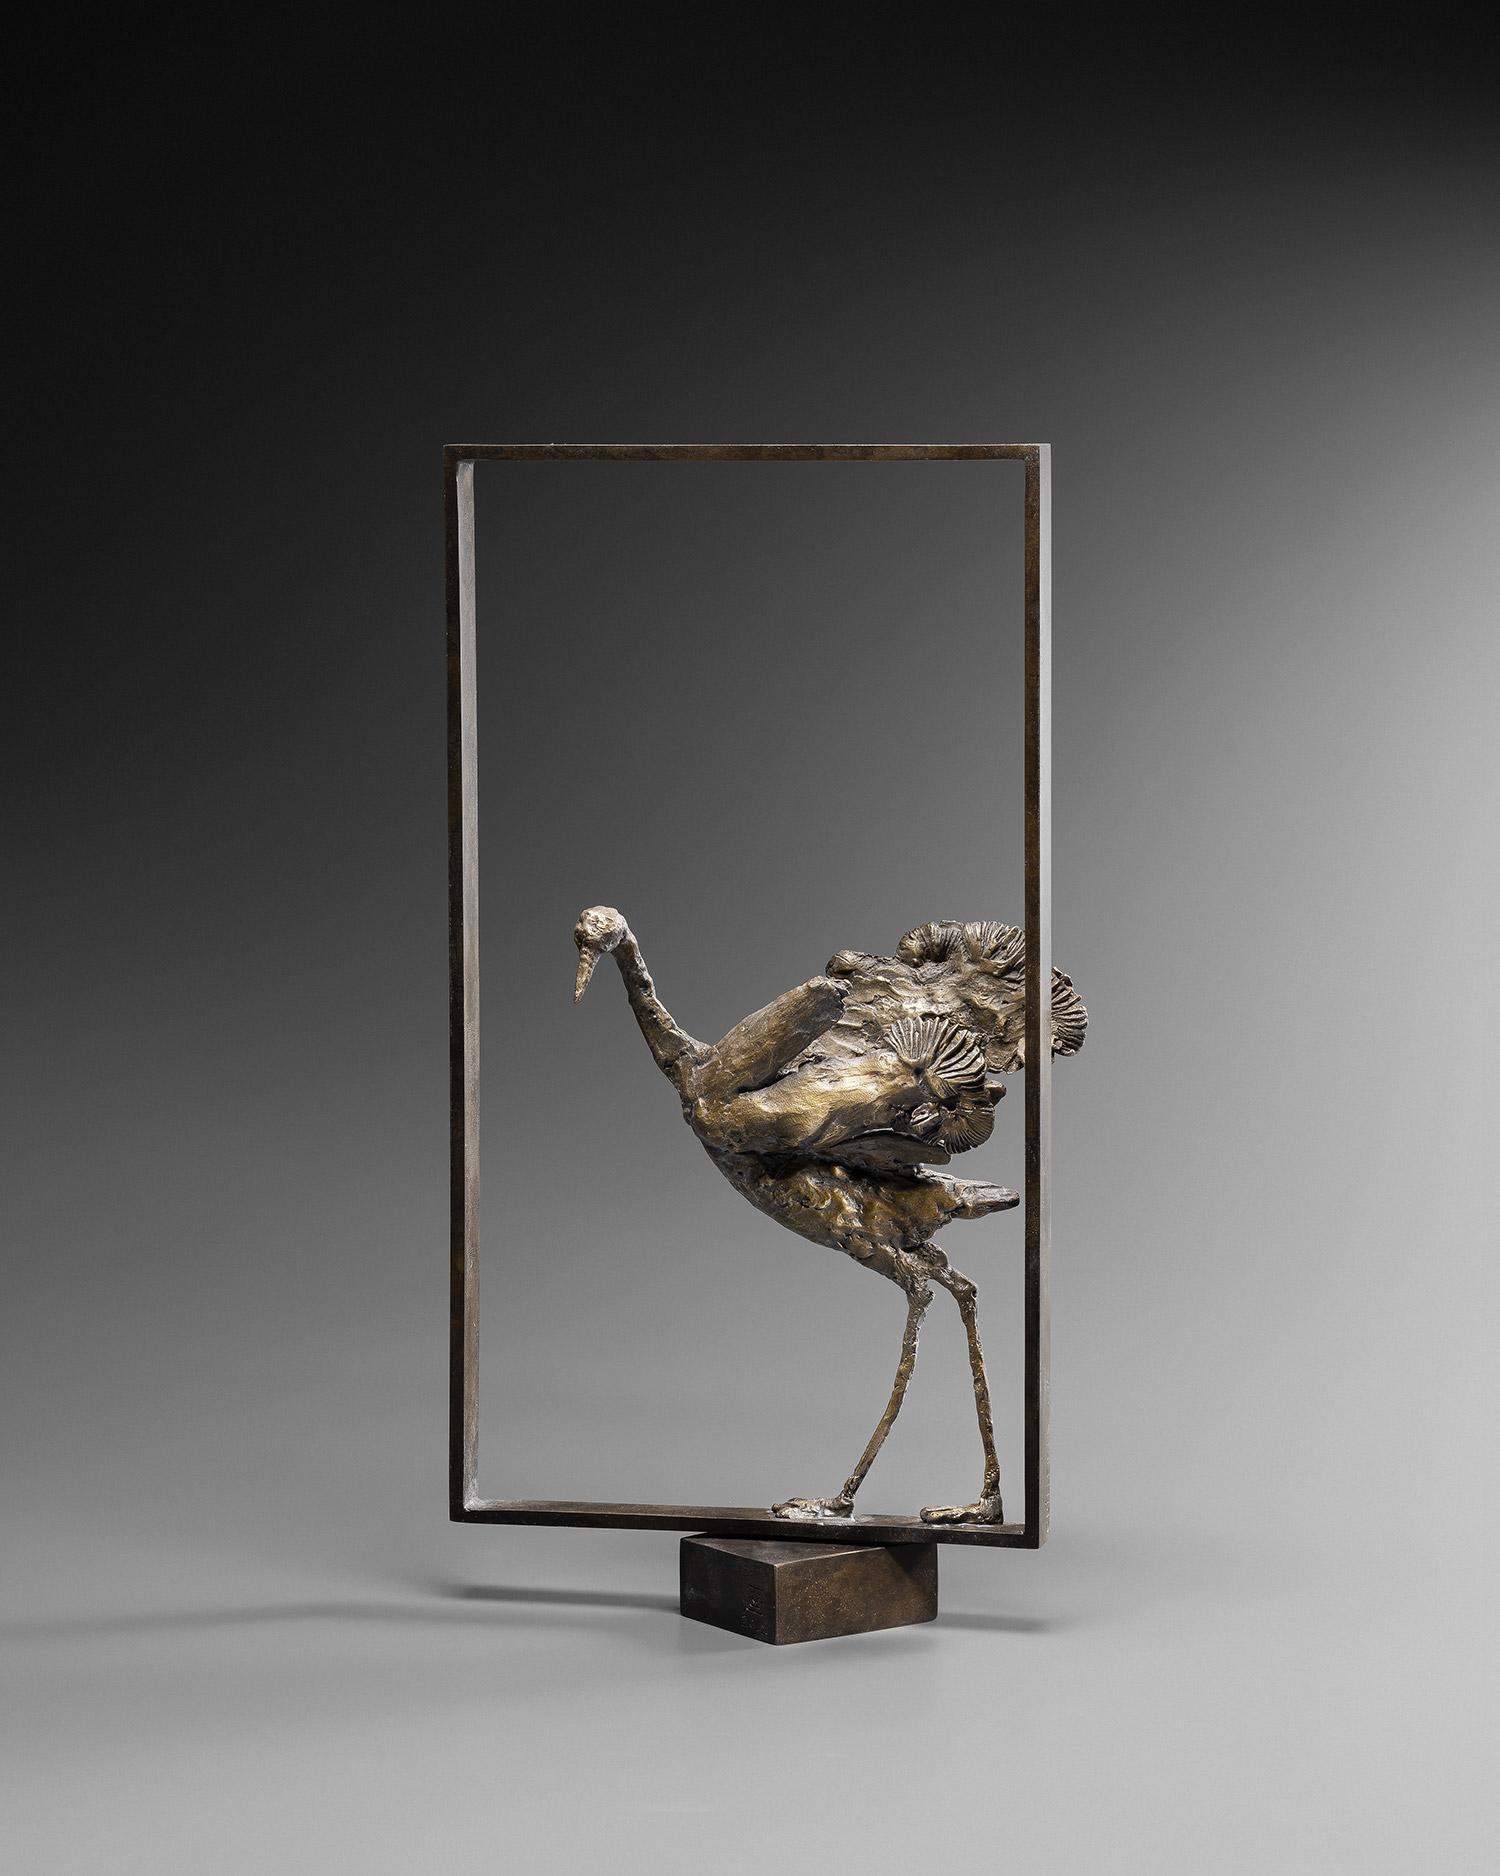 8-Guillemin-Danse-a-Hokkaido-profil-gauche-galerie-bettina-art-contemporain-paris